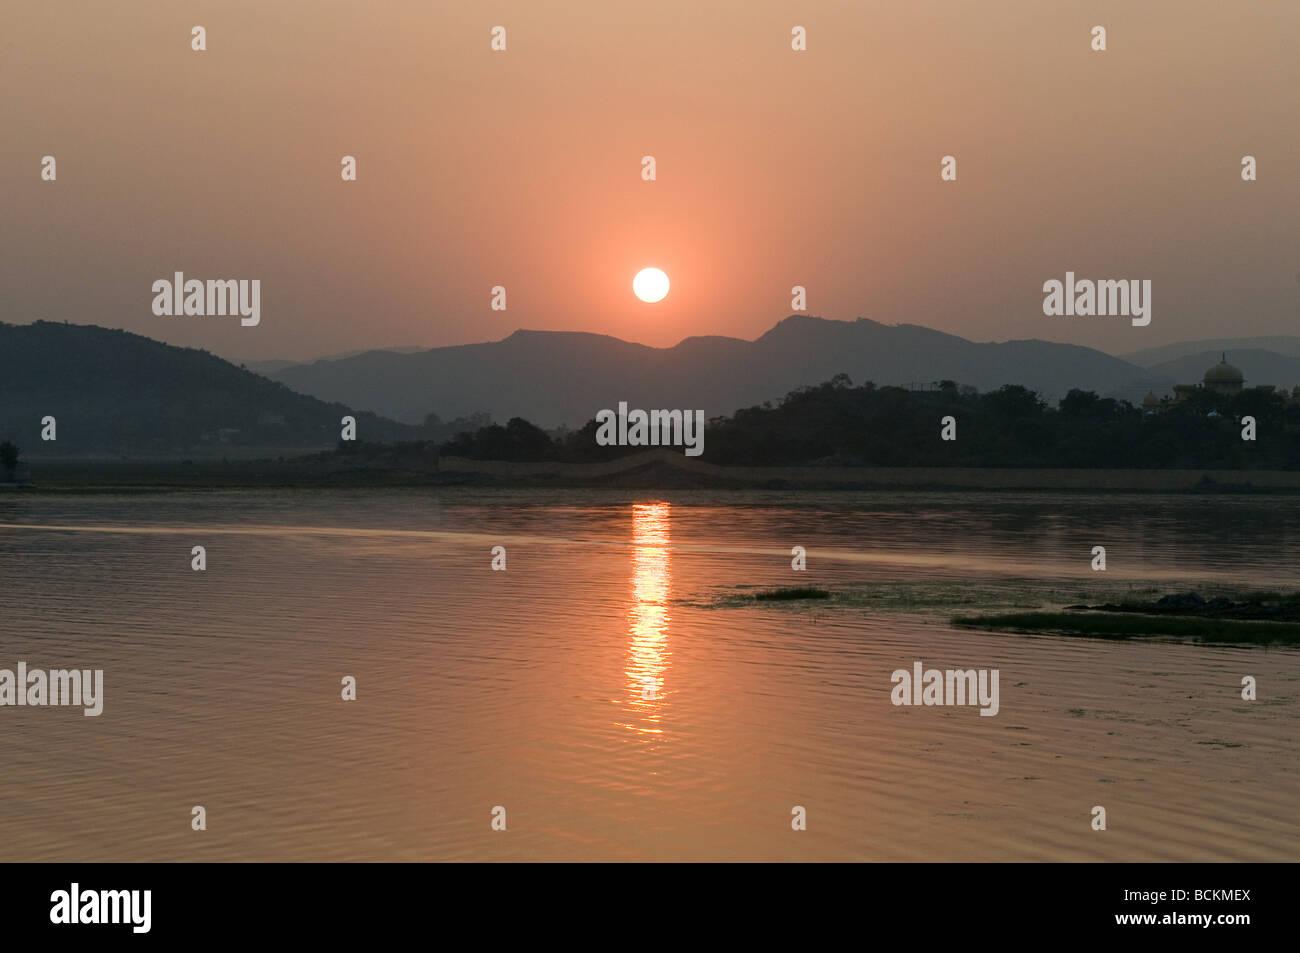 Sunset over lake pichola Stock Photo